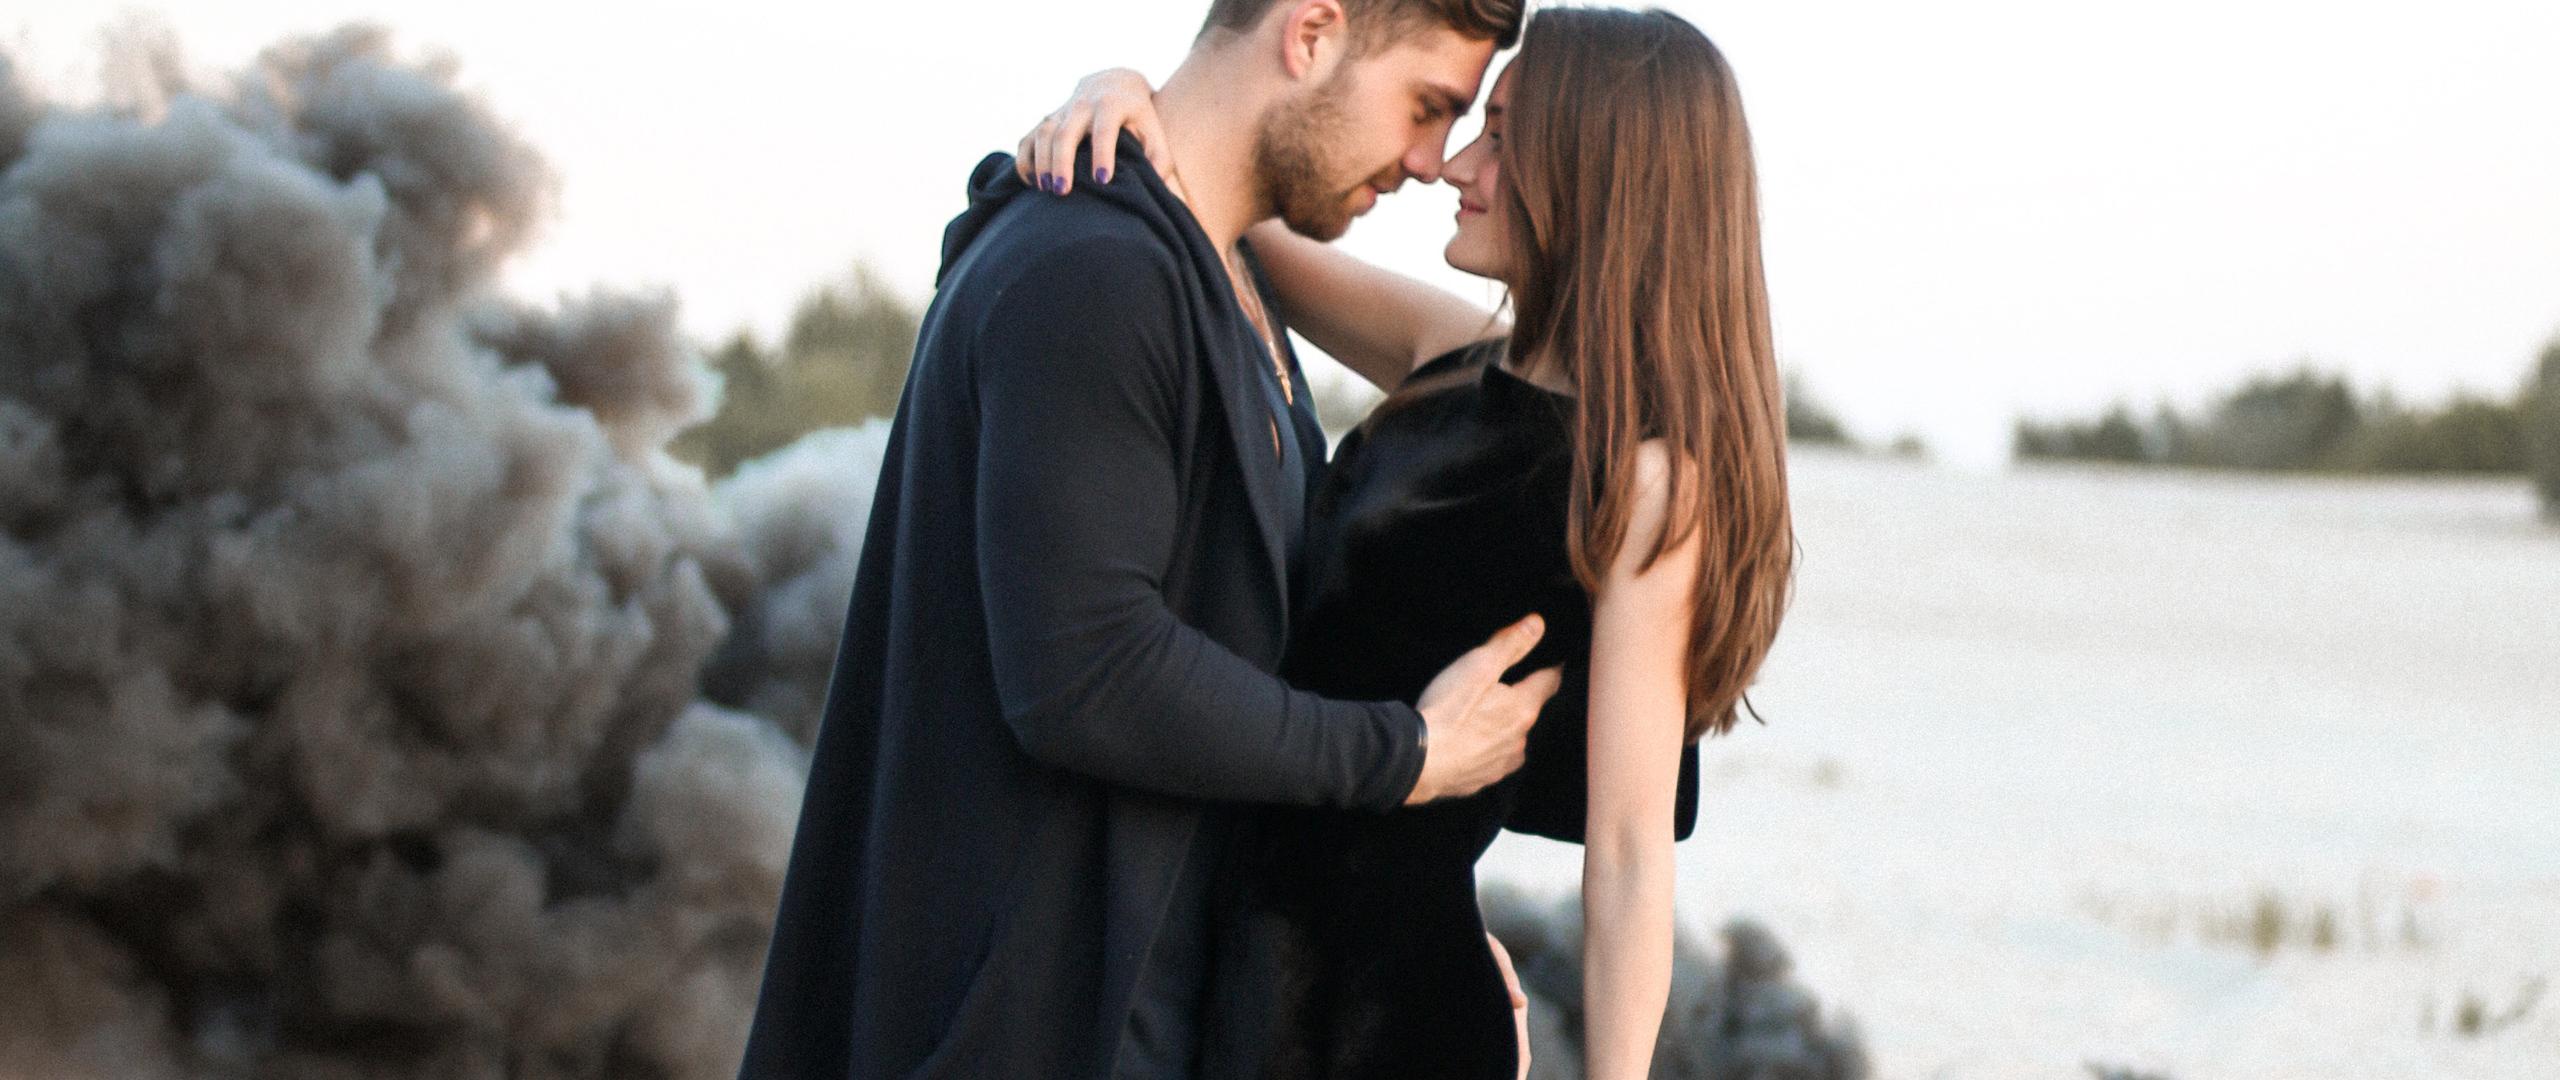 cute-couple-black-clothing-beach-side-iy.jpg